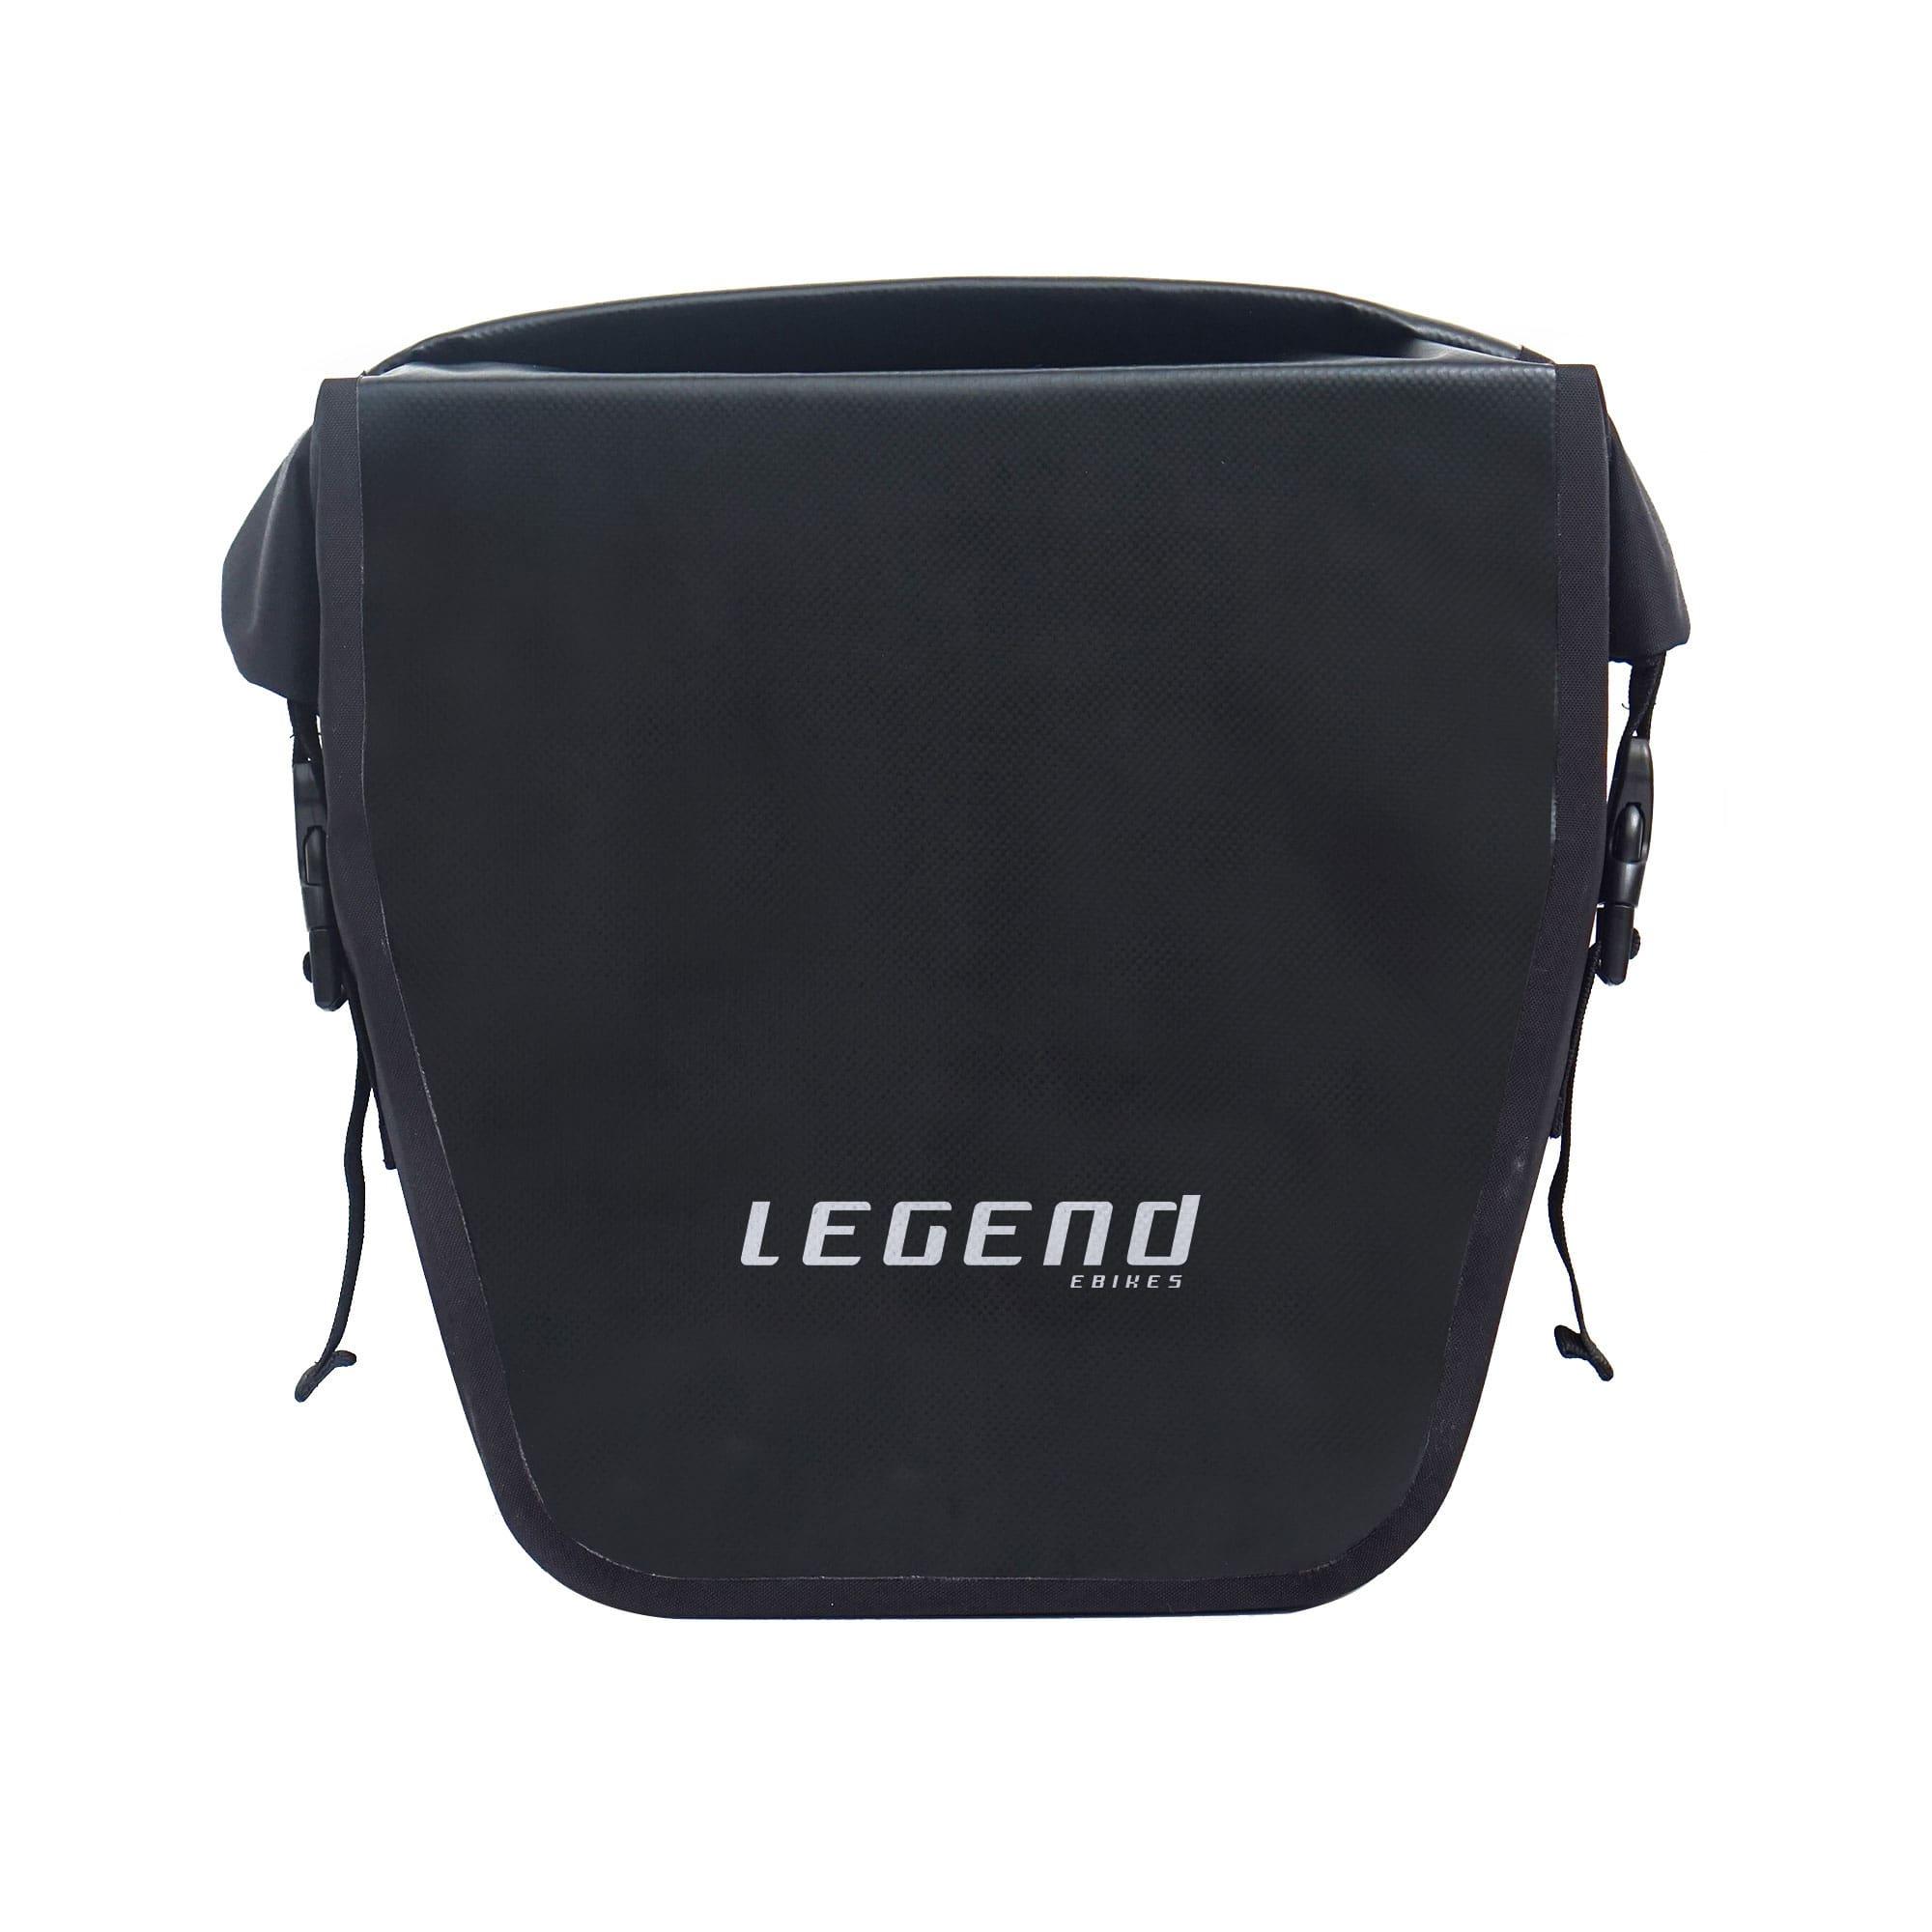 Legend etanche grand sacoche 1 sac noir